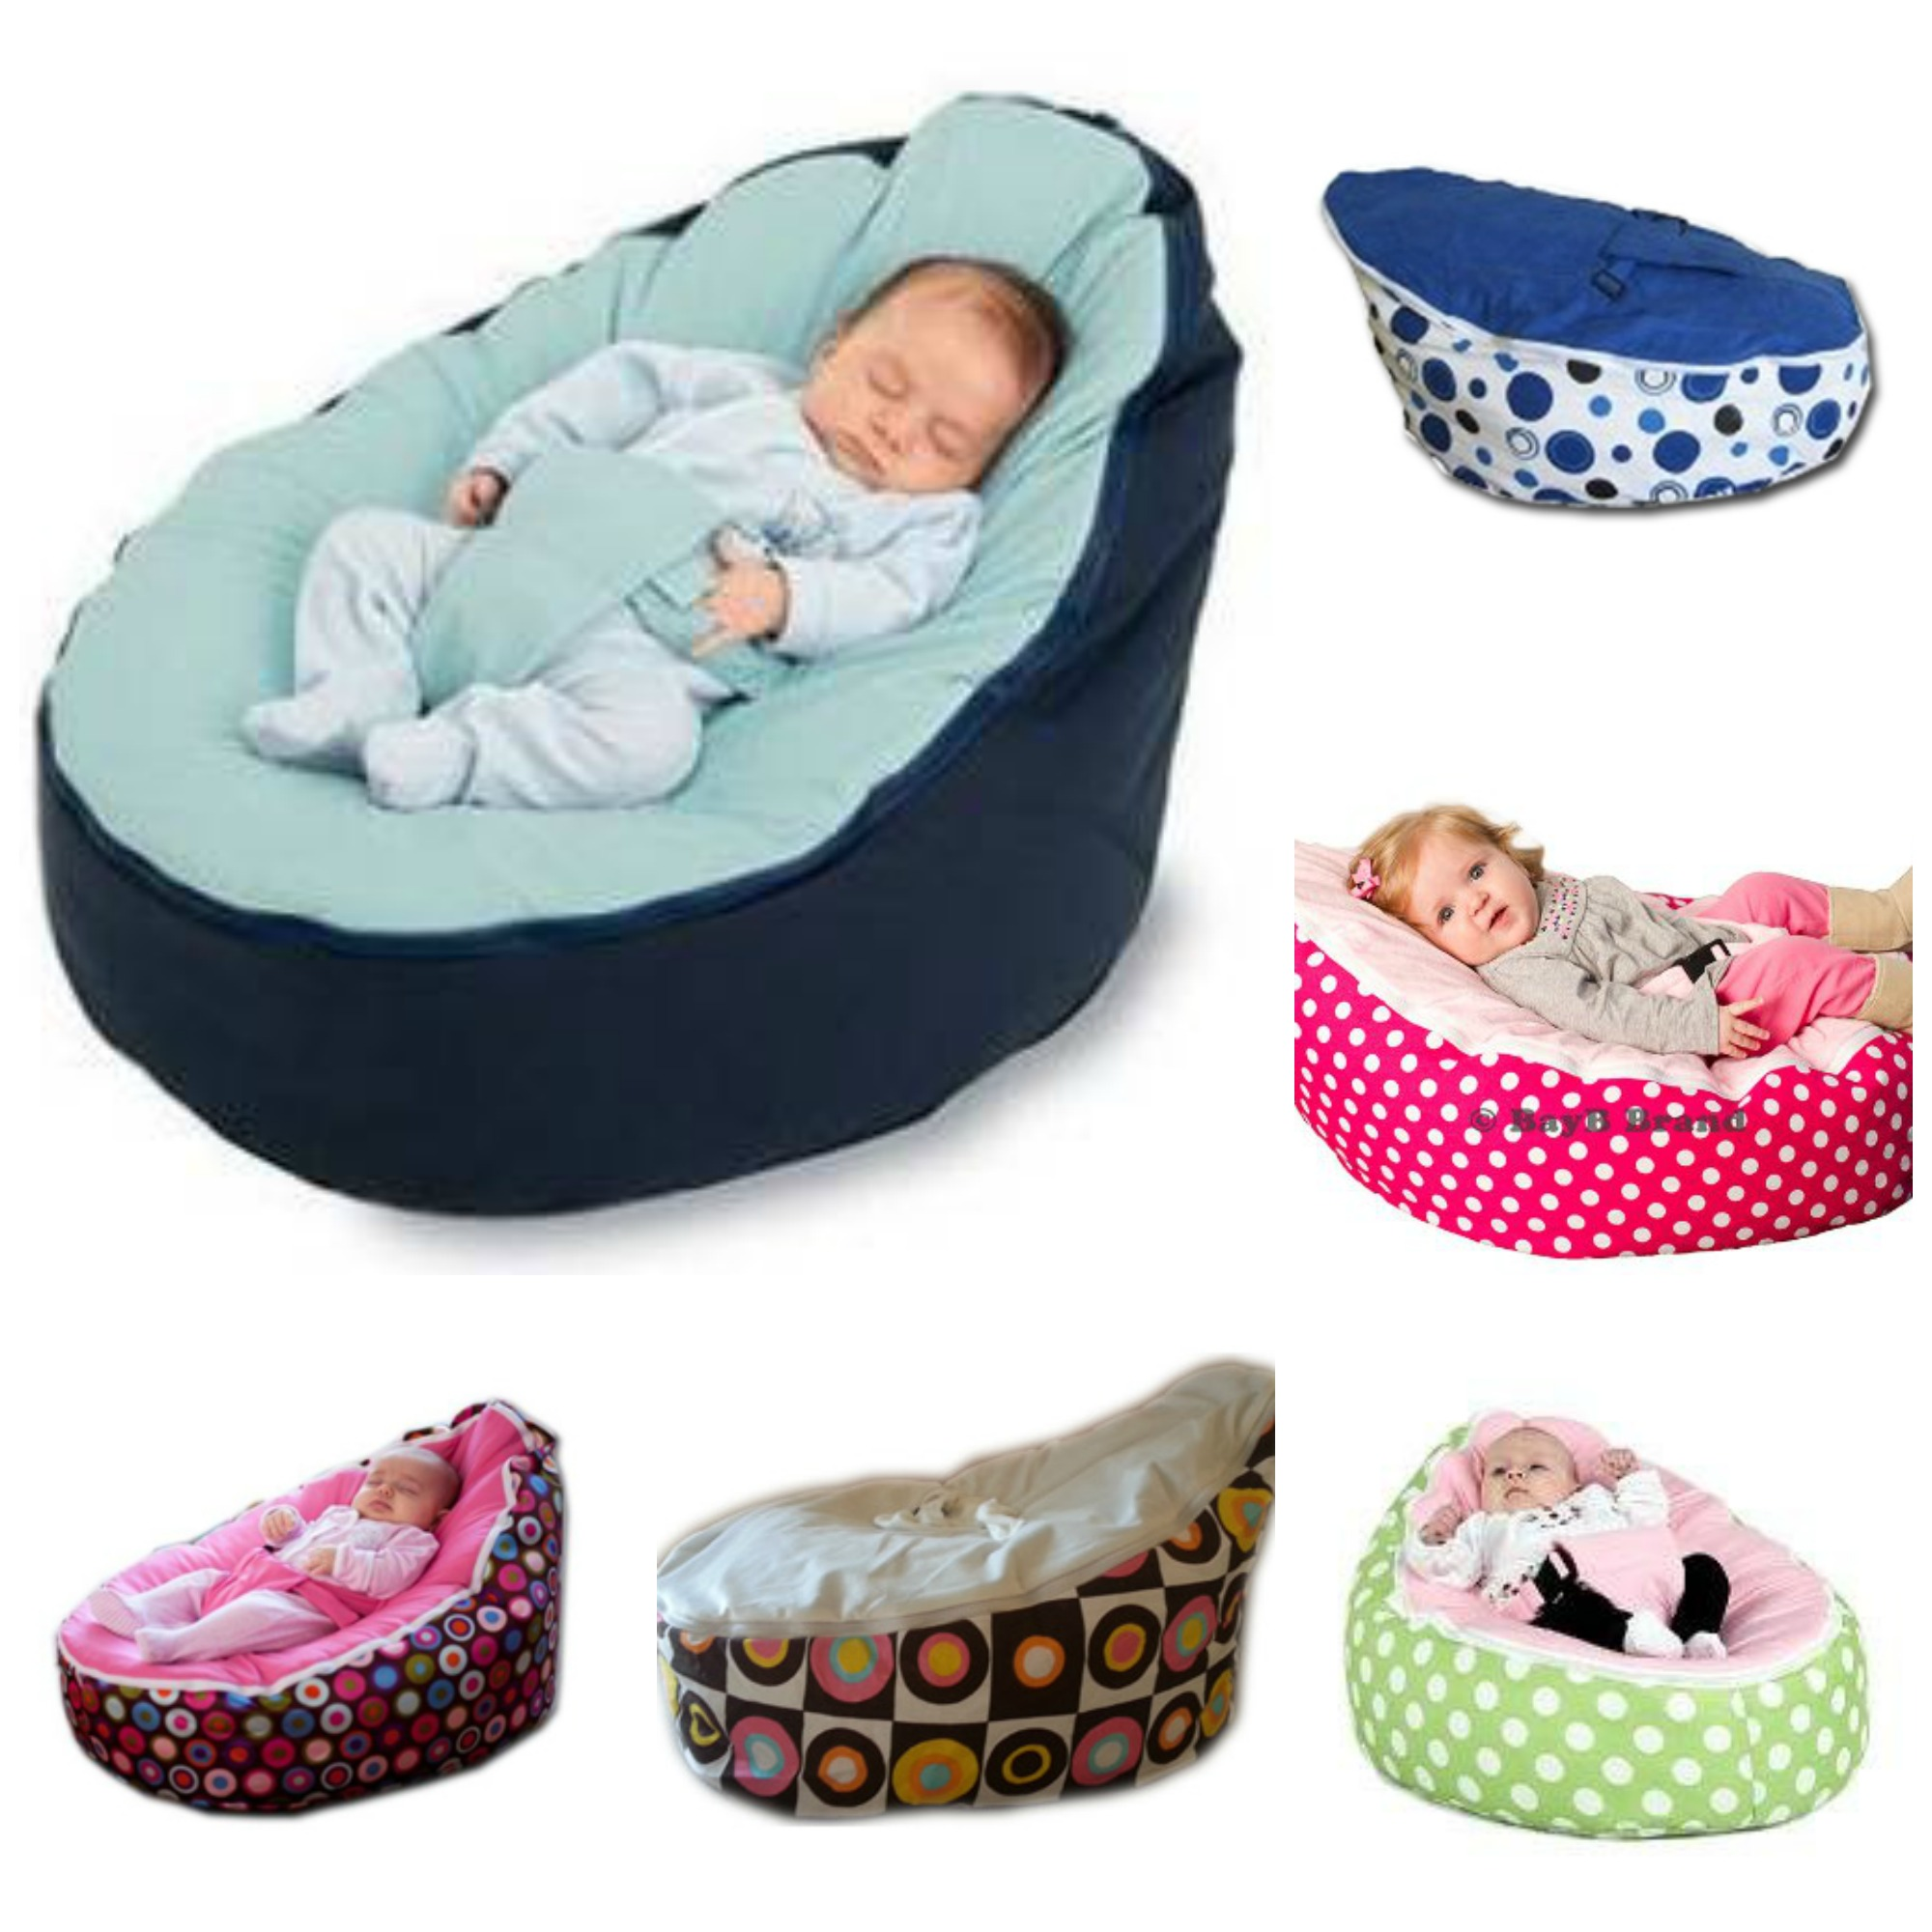 Baby bean bag chair - Picmonkey Collage